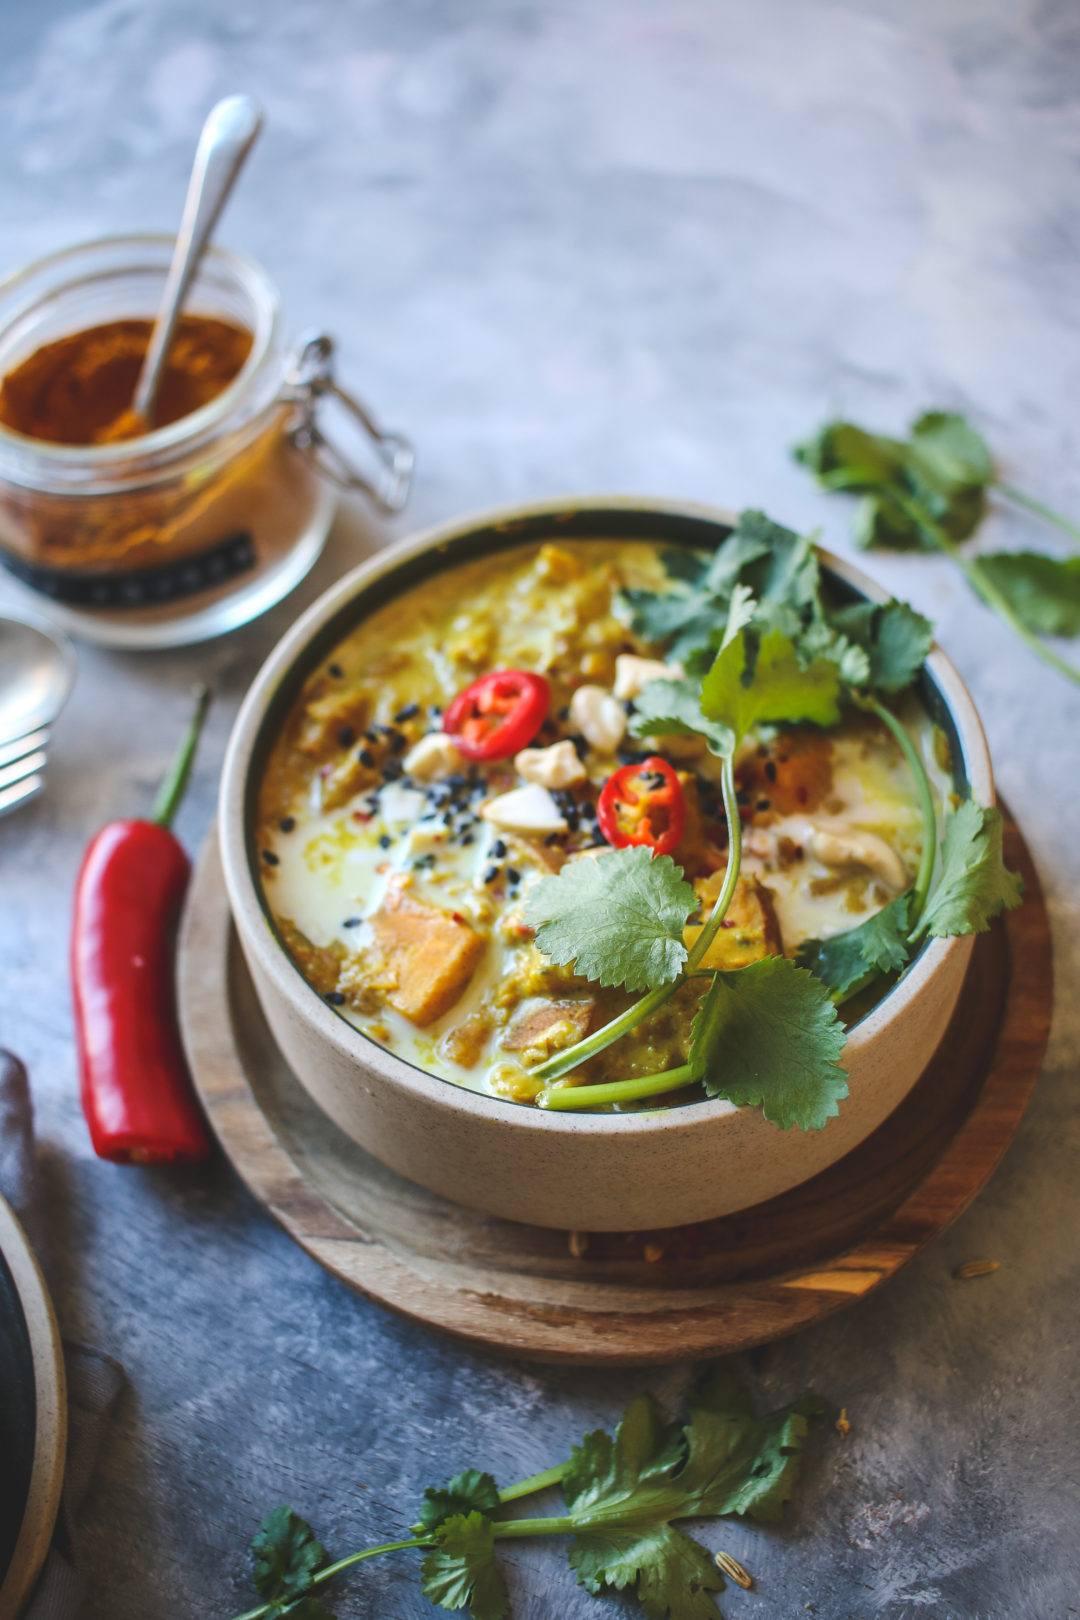 vegan sweet potato and peanut dal recipe